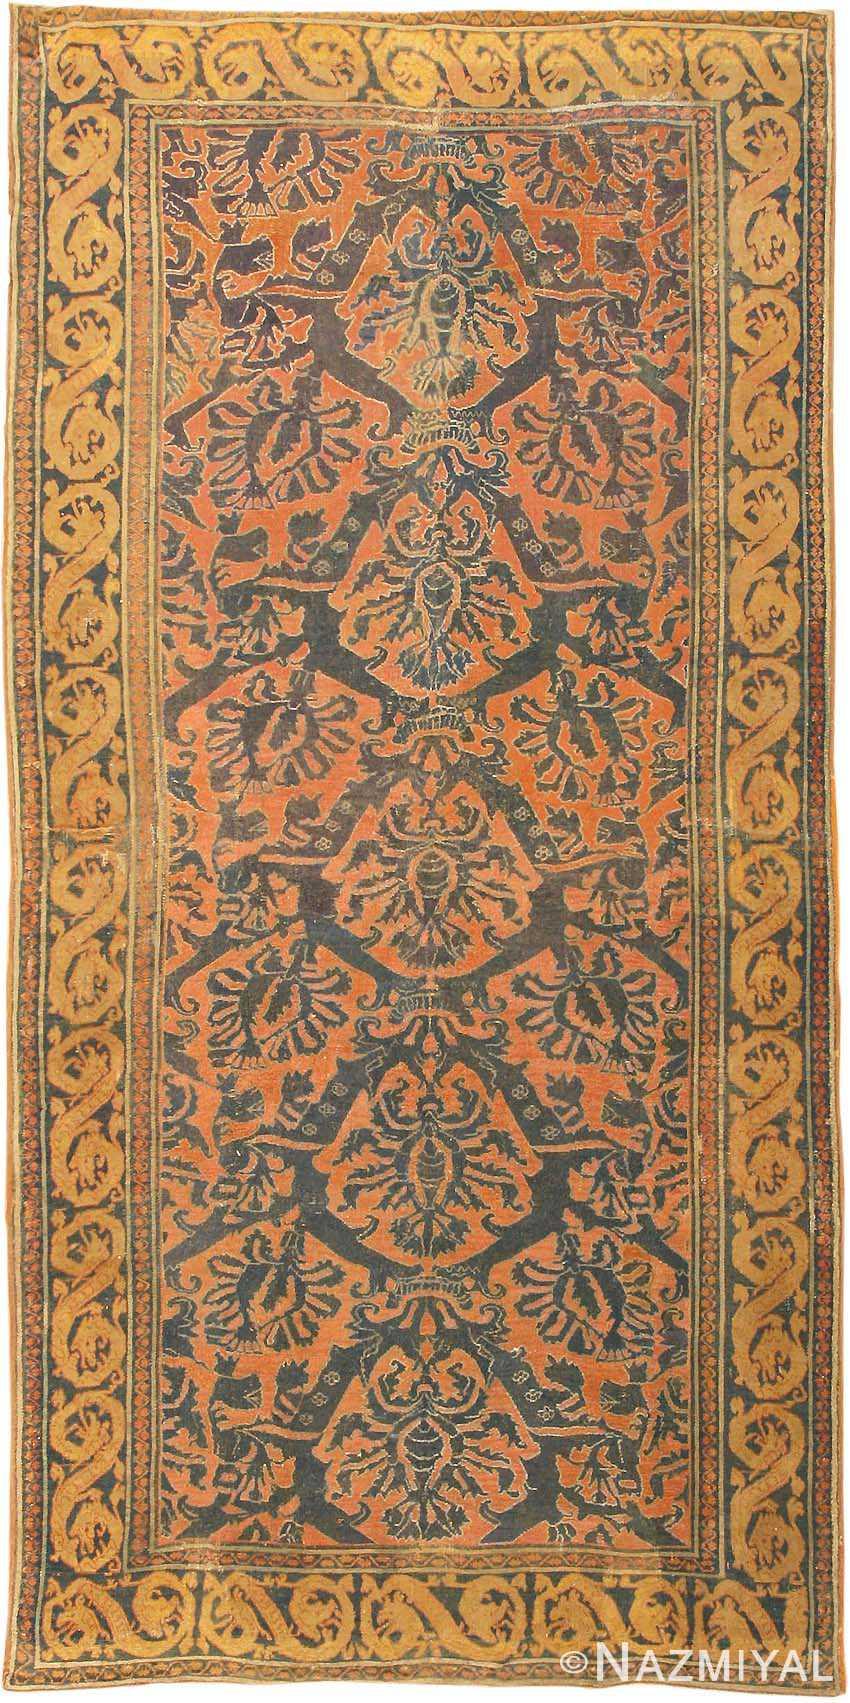 Antique 16th Century Alcaraz Oriental Rug 3288 Nazmiyal